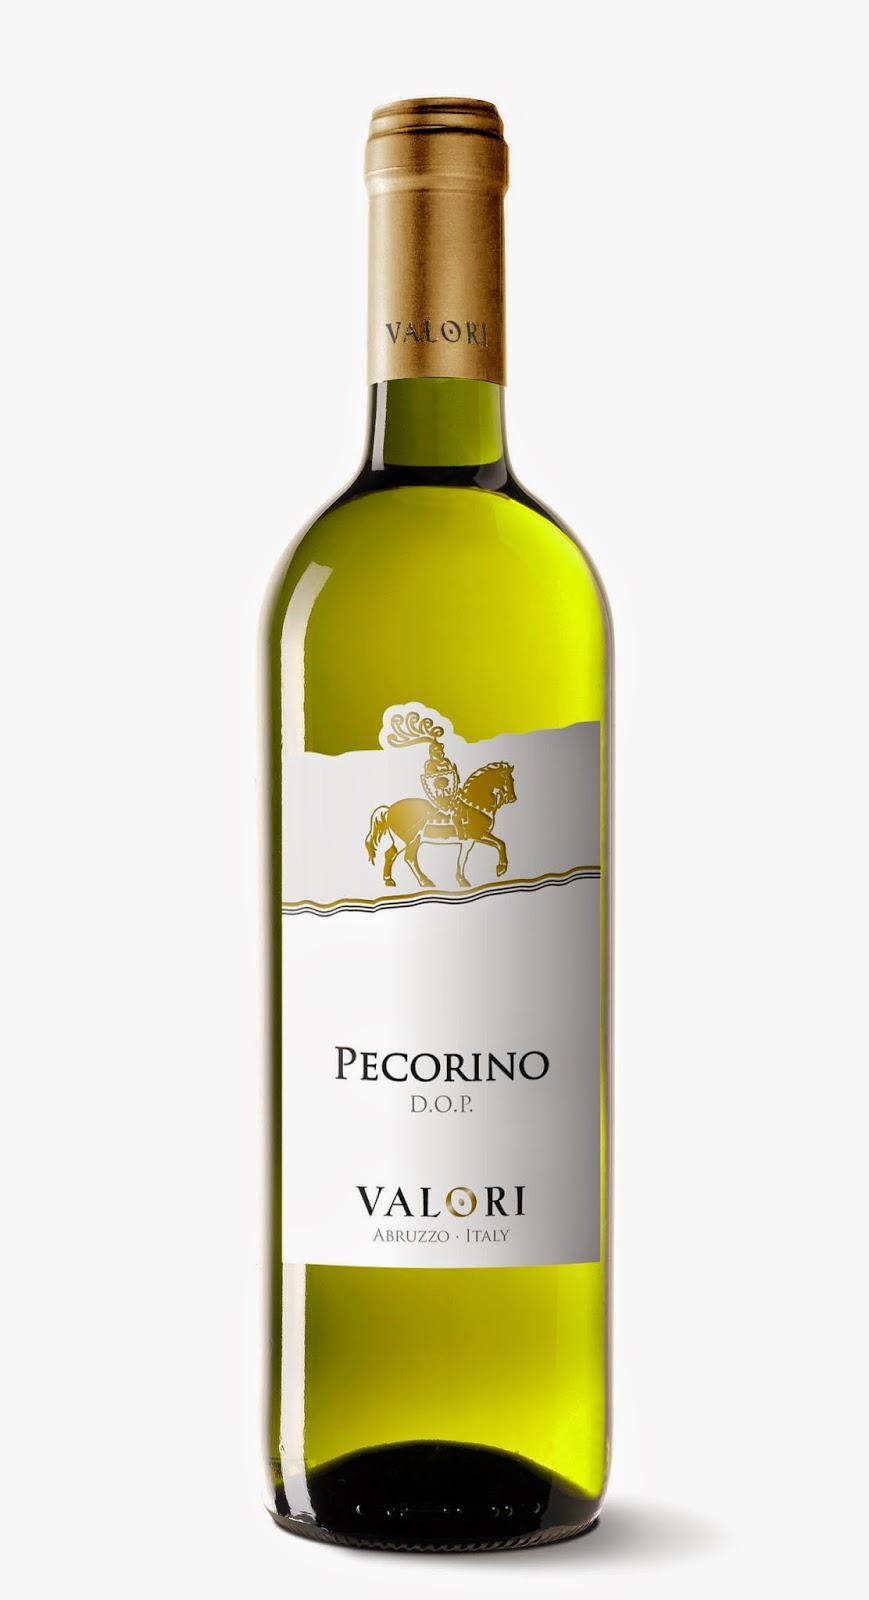 2013 Valori Pecorino